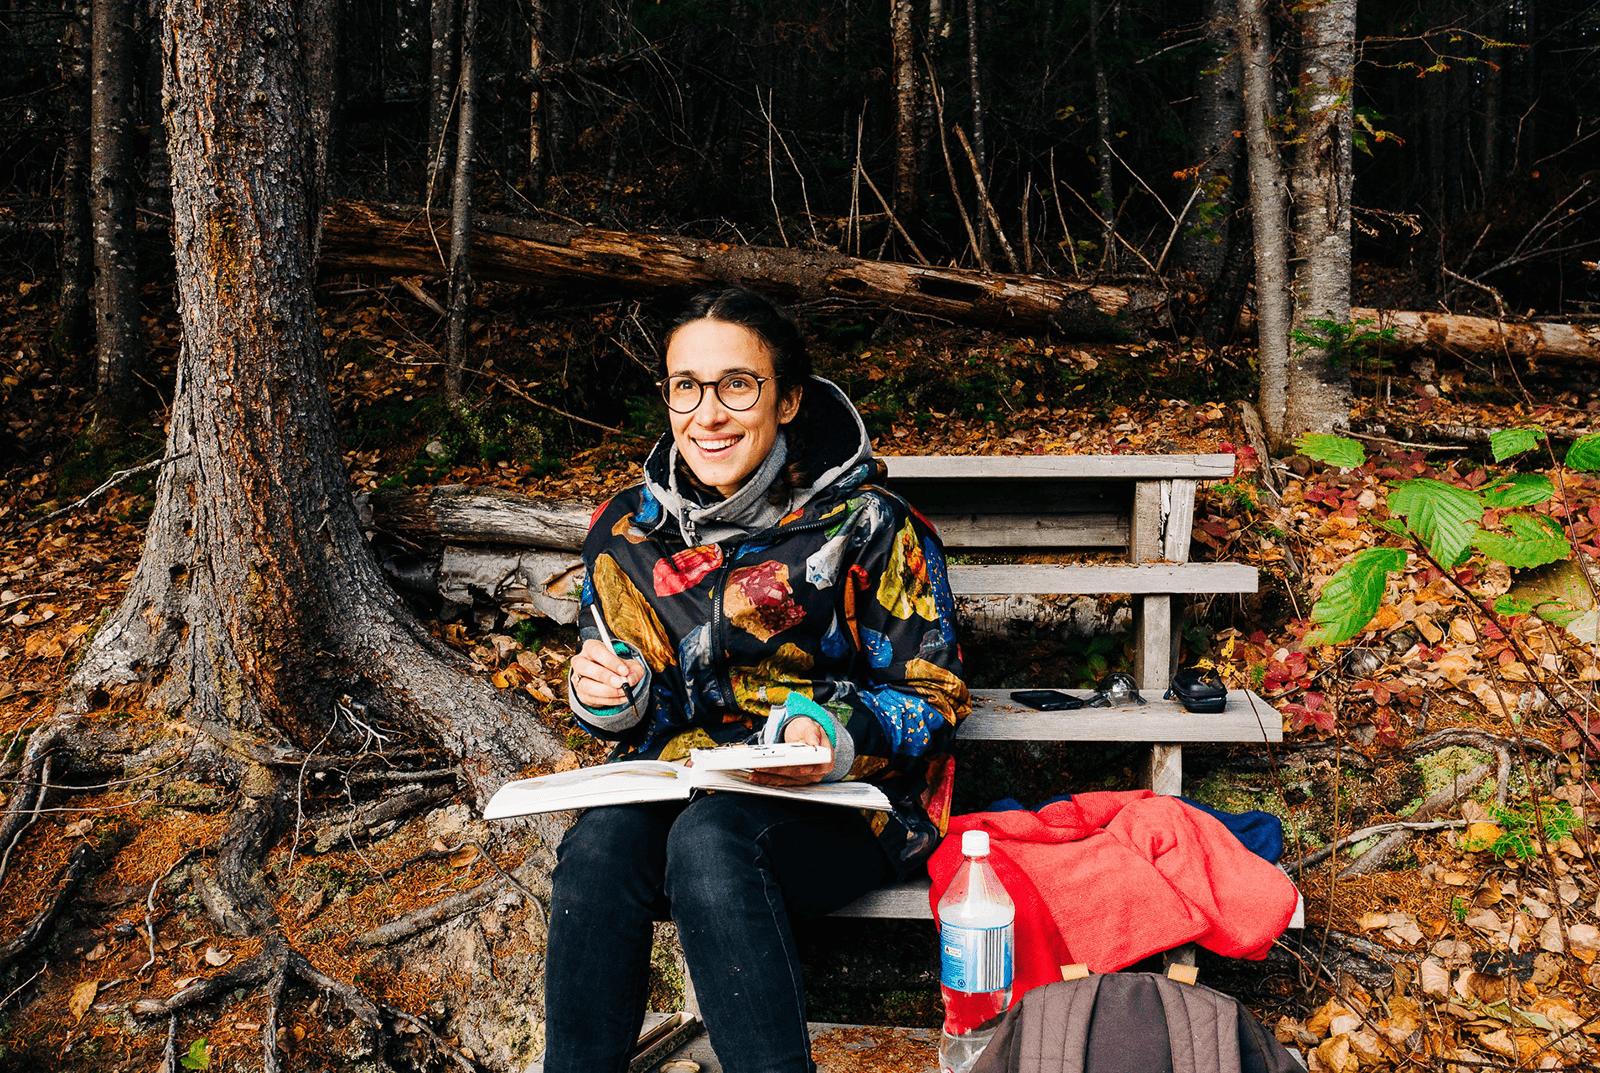 Amandine Thomas sketching in Canada